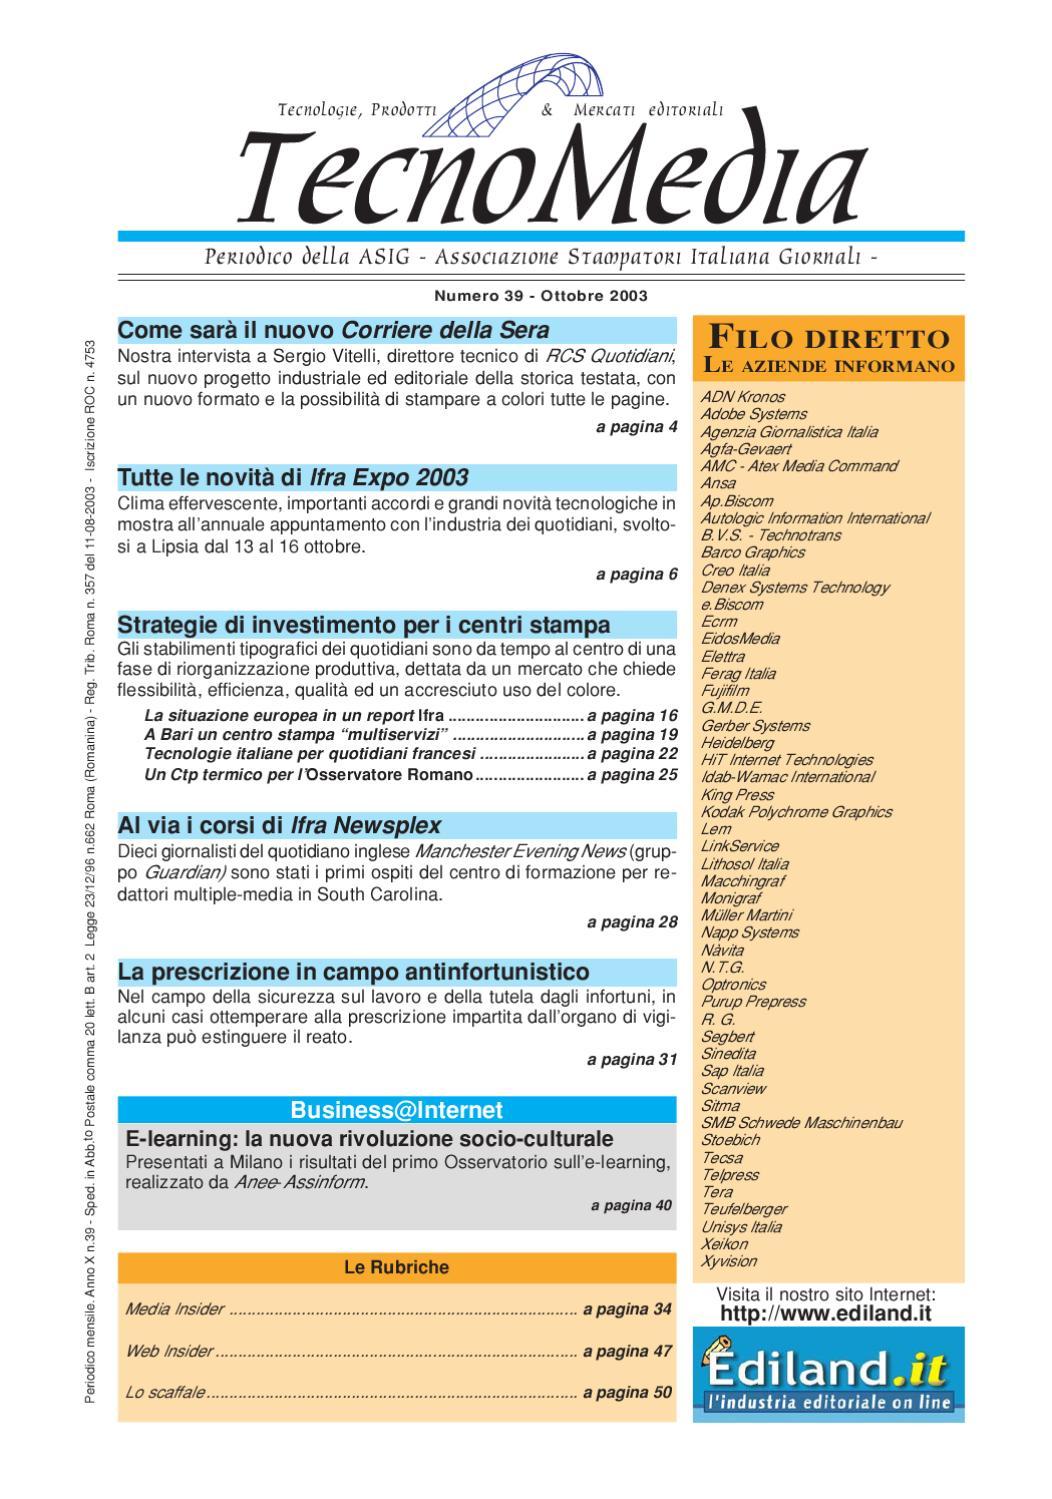 a2165480ea TecnoMedia 39 by ASIG Associazione Stampatori Italiana Giornali - issuu